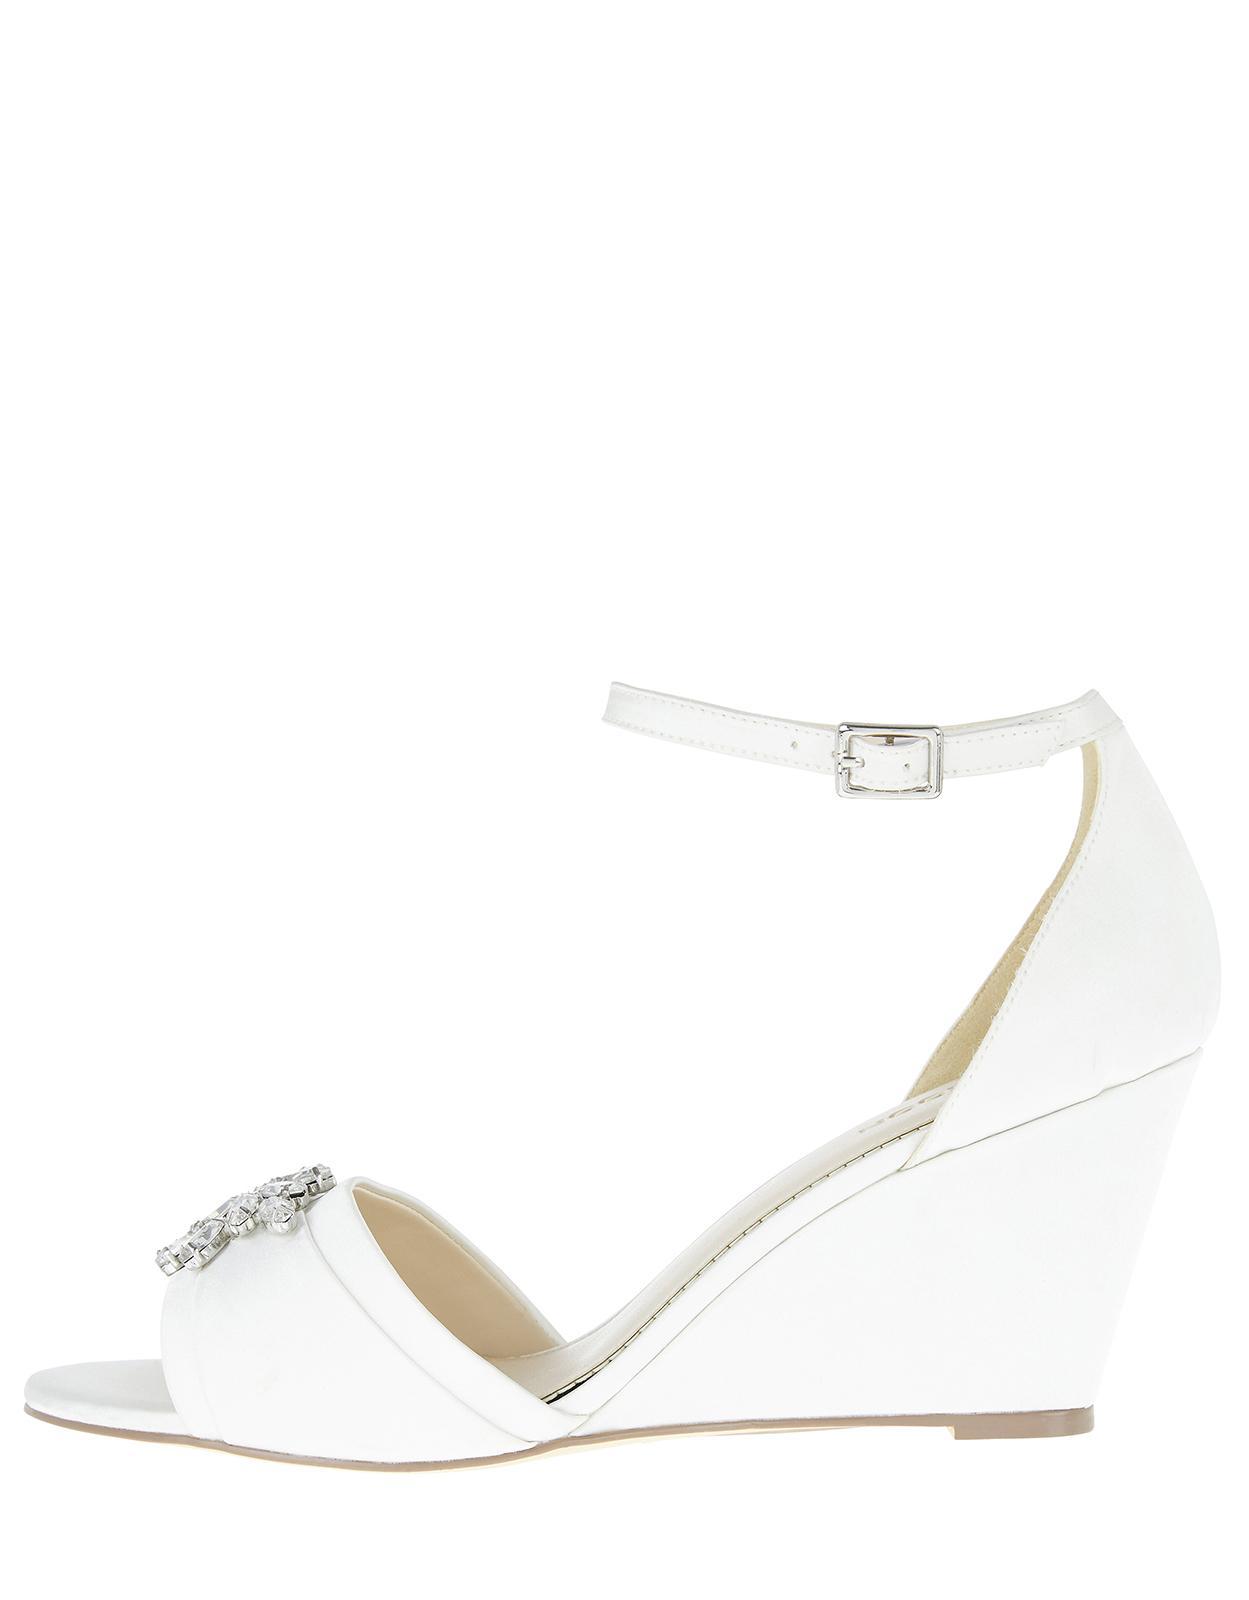 feac1f4bfefb1b Monsoon Diana Diamante Jewel Wedge Heels in White - Lyst